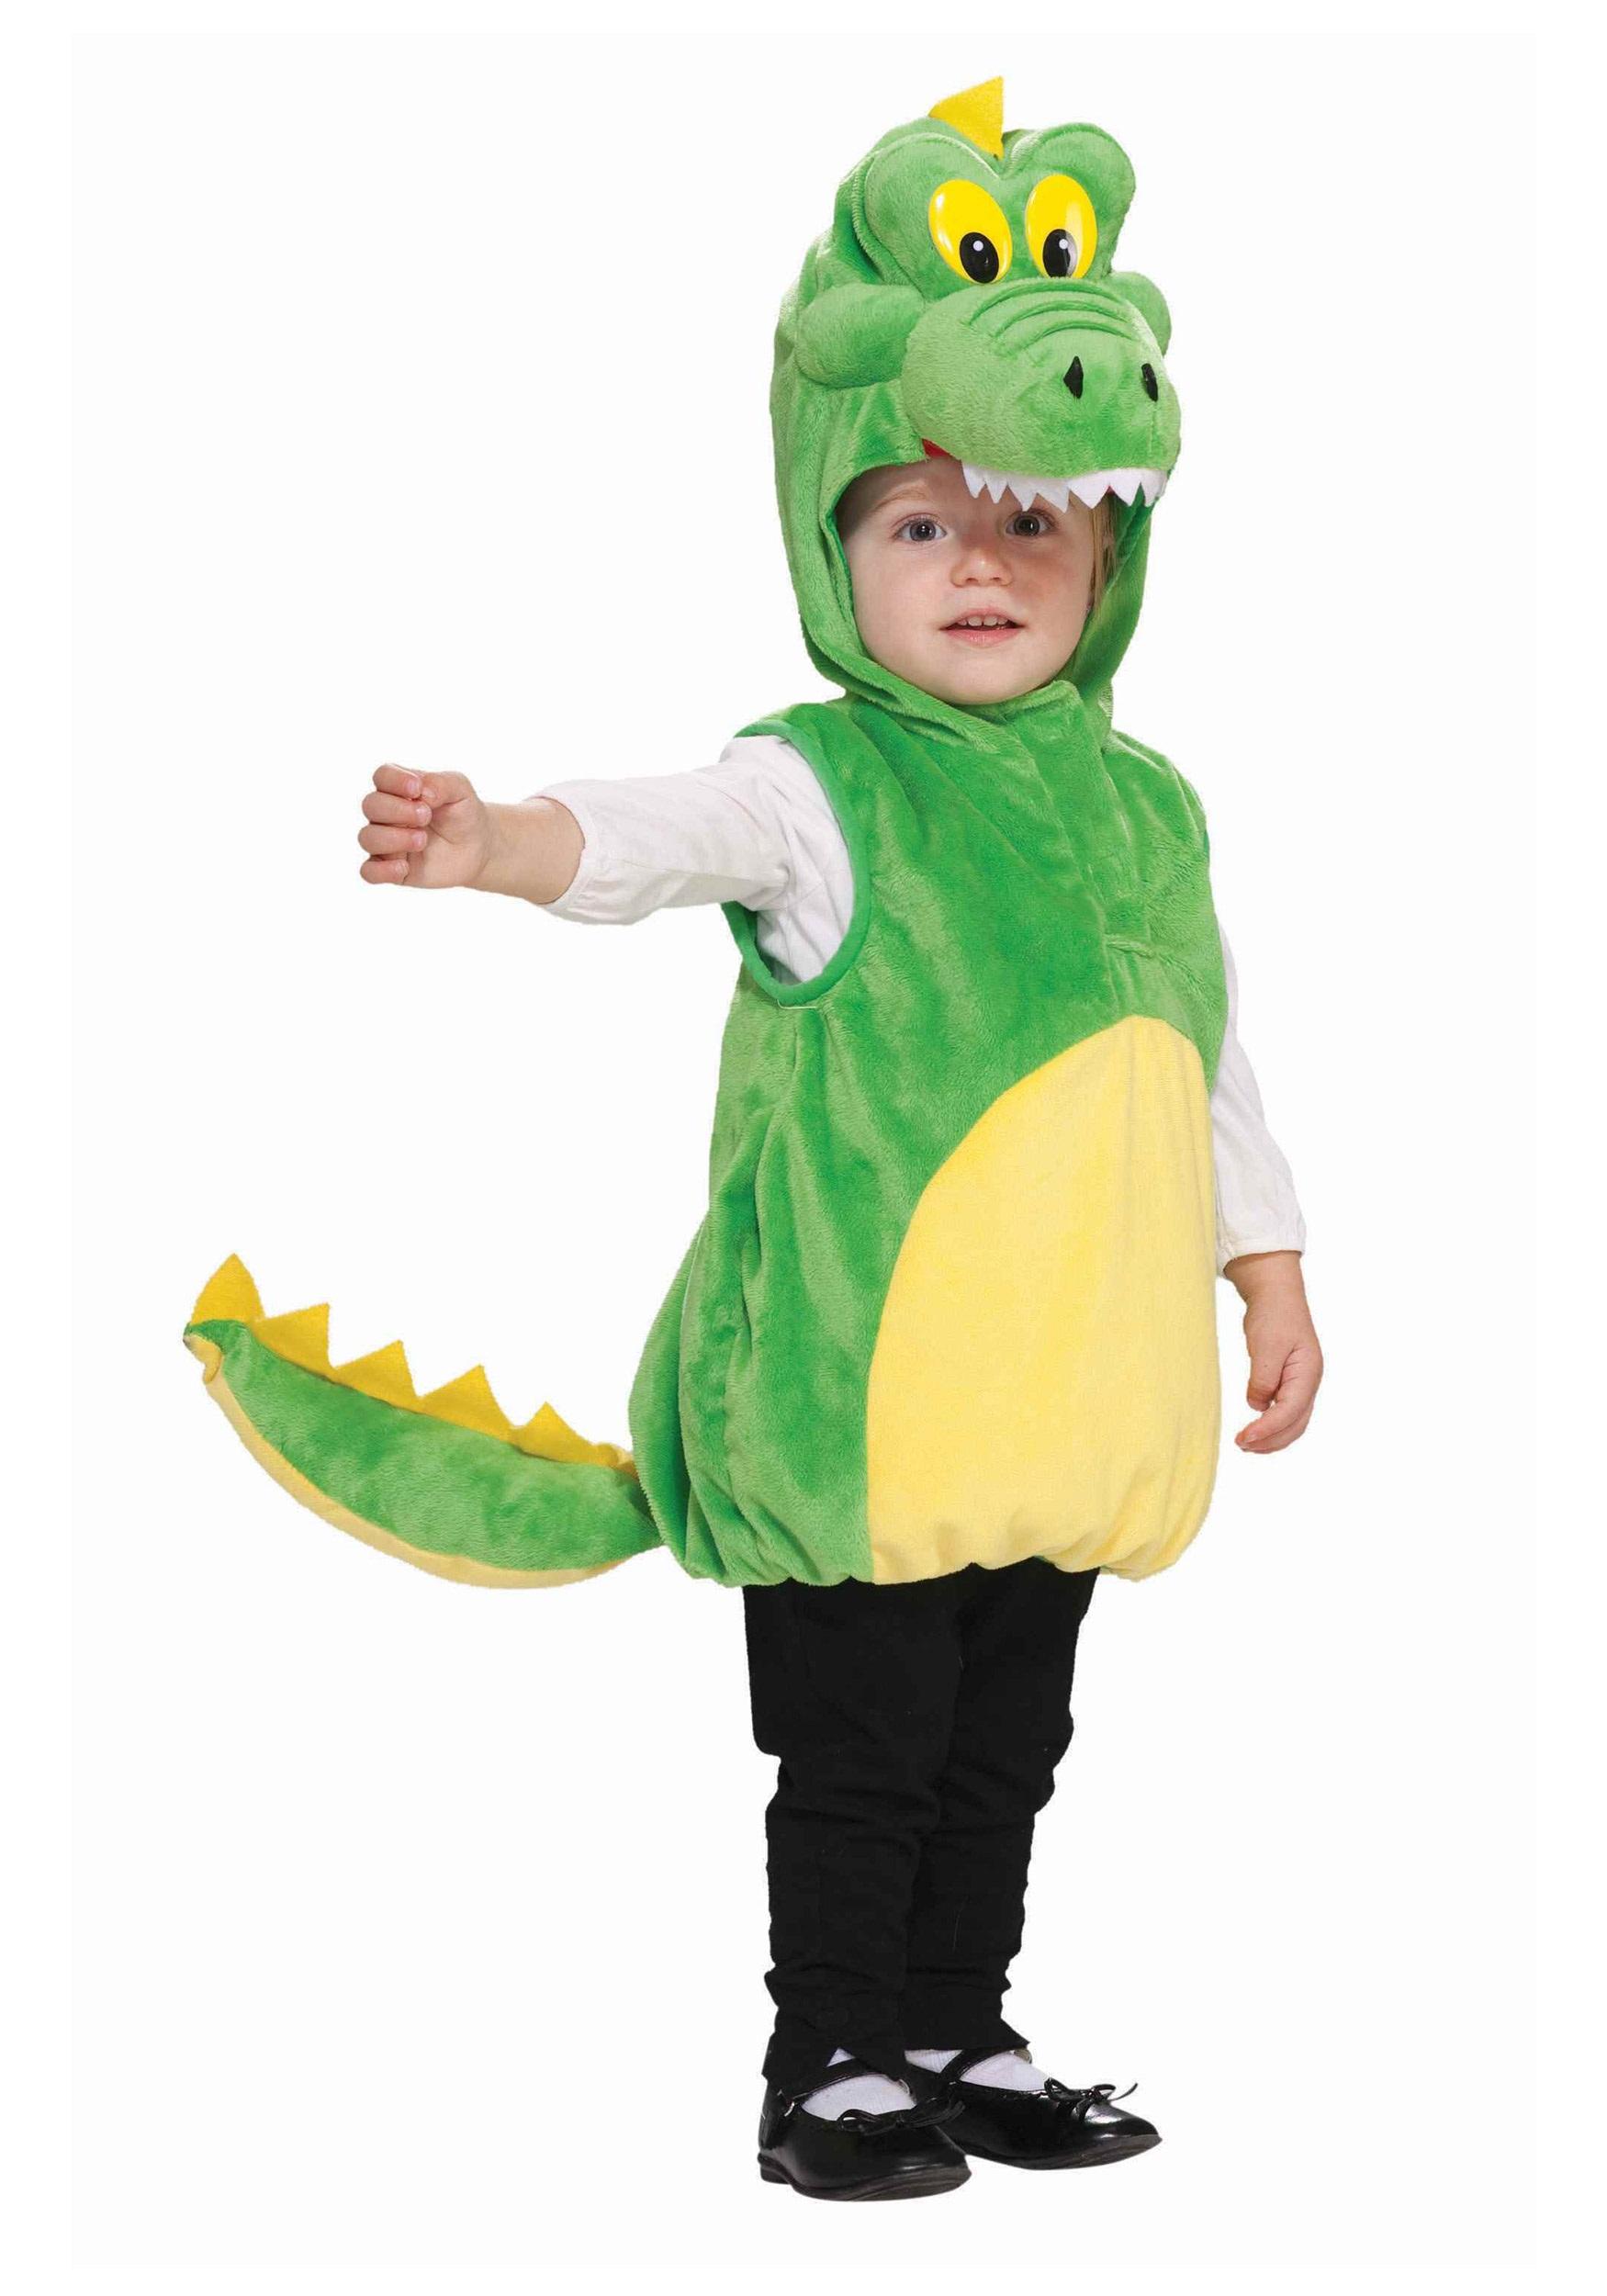 Child Crocodile Costume  sc 1 st  Halloween Costumes & Child Crocodile Costume - Halloween Costumes